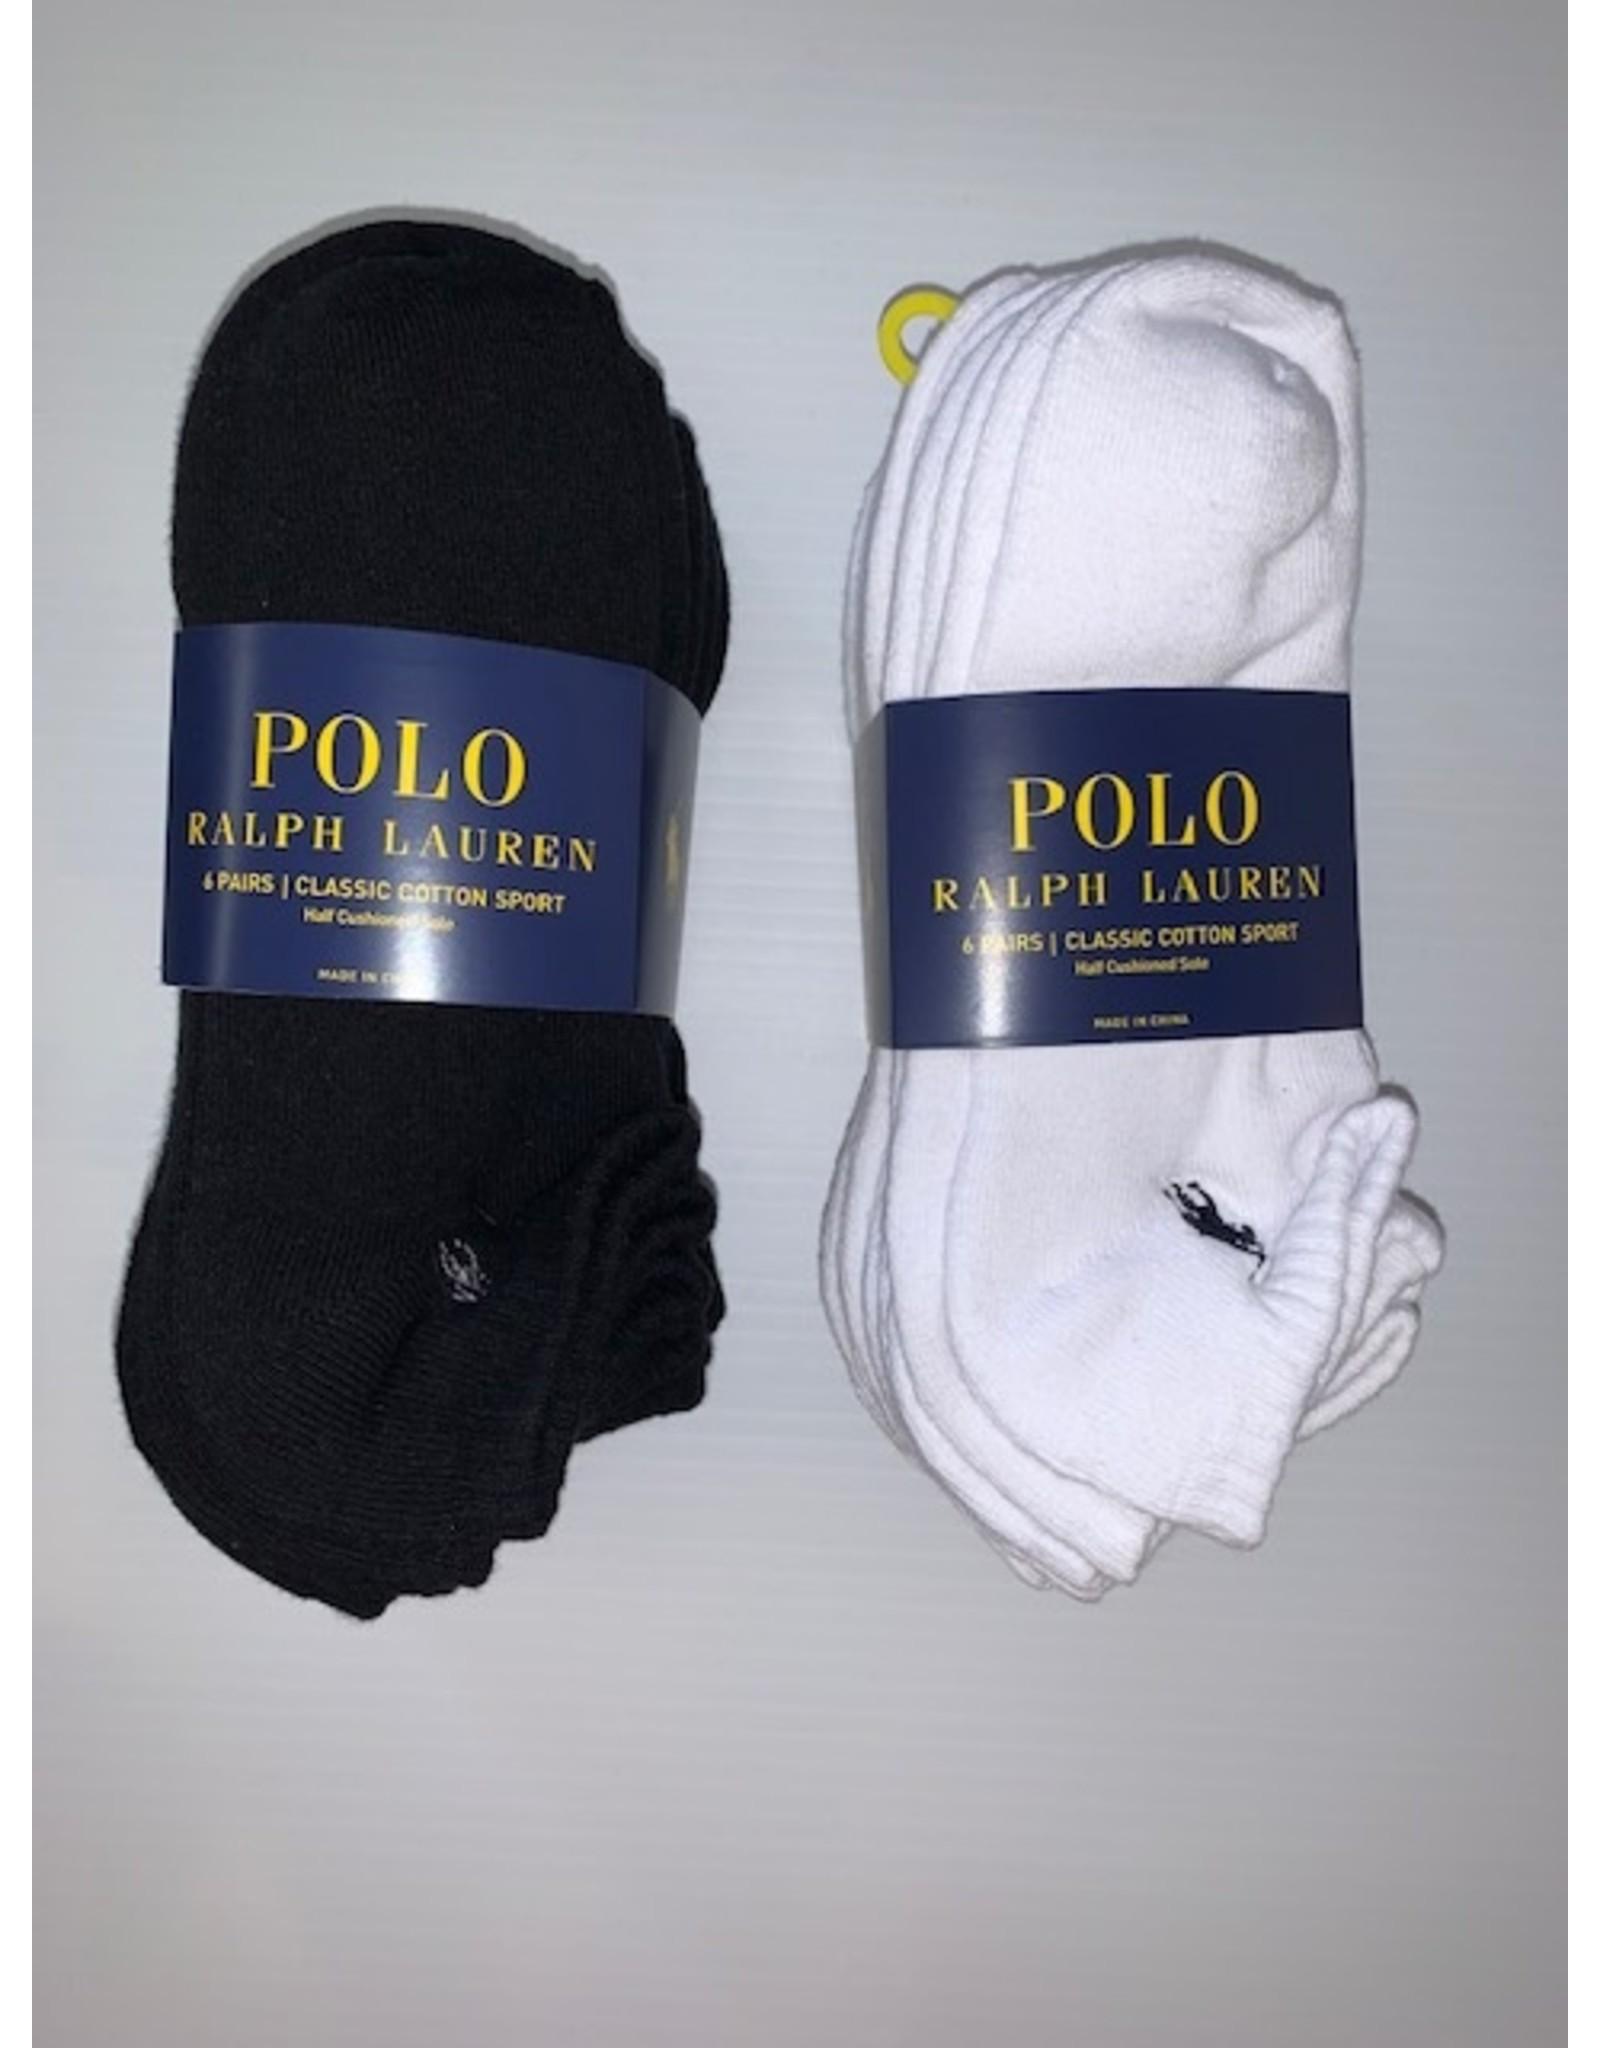 Polo Ralph Lauren  Polo Ralph Lauren Men's Low Cut Cotton Sport Socks 6-Pack